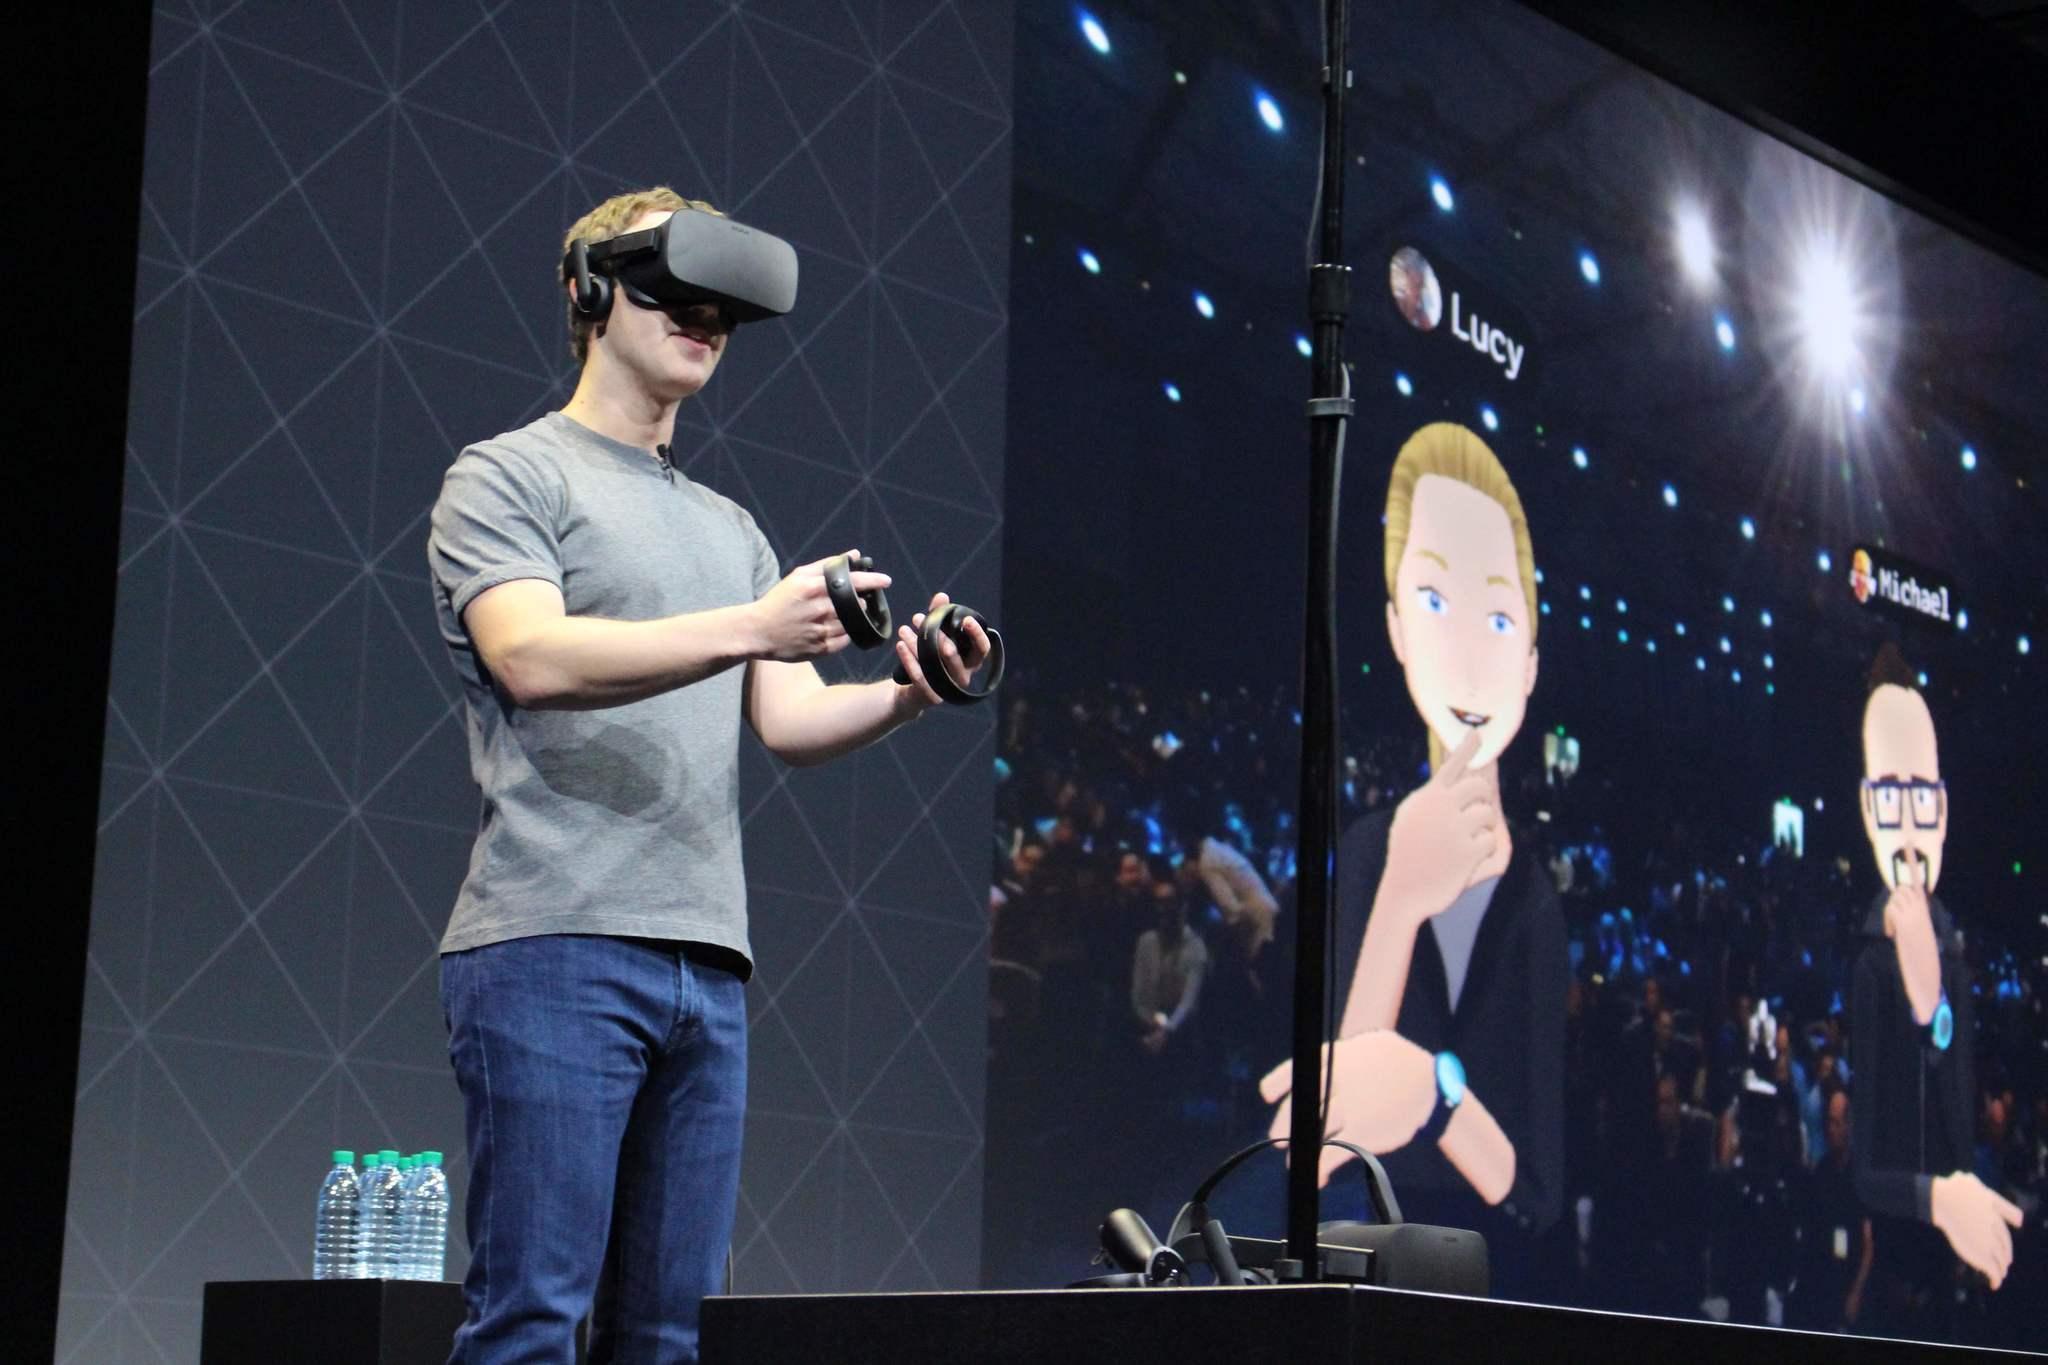 Facebook Buys Oculus Rift Virtual Reality Manufacturer